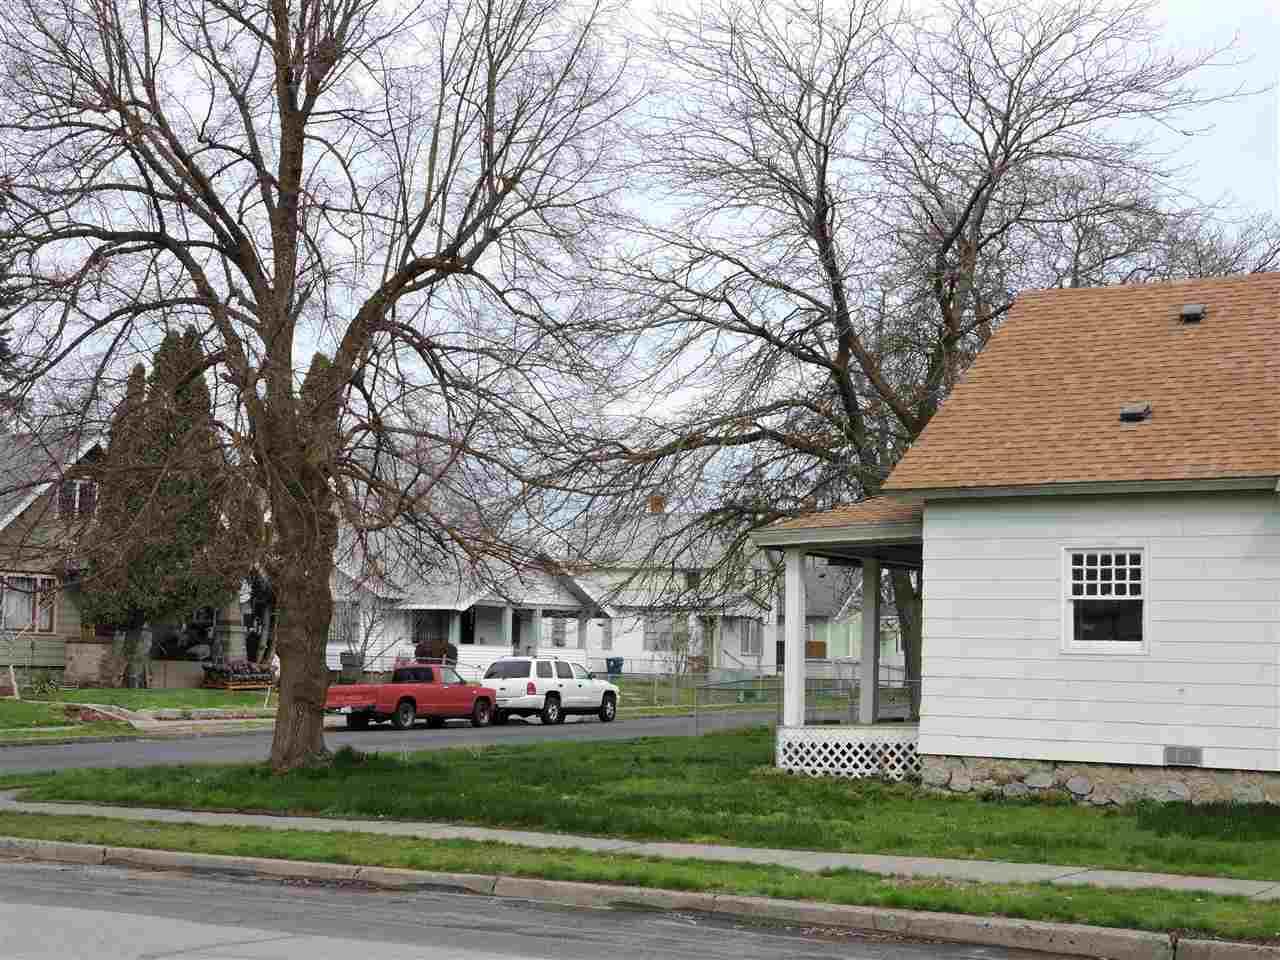 327 S Greene St, Spokane, WA - USA (photo 4)